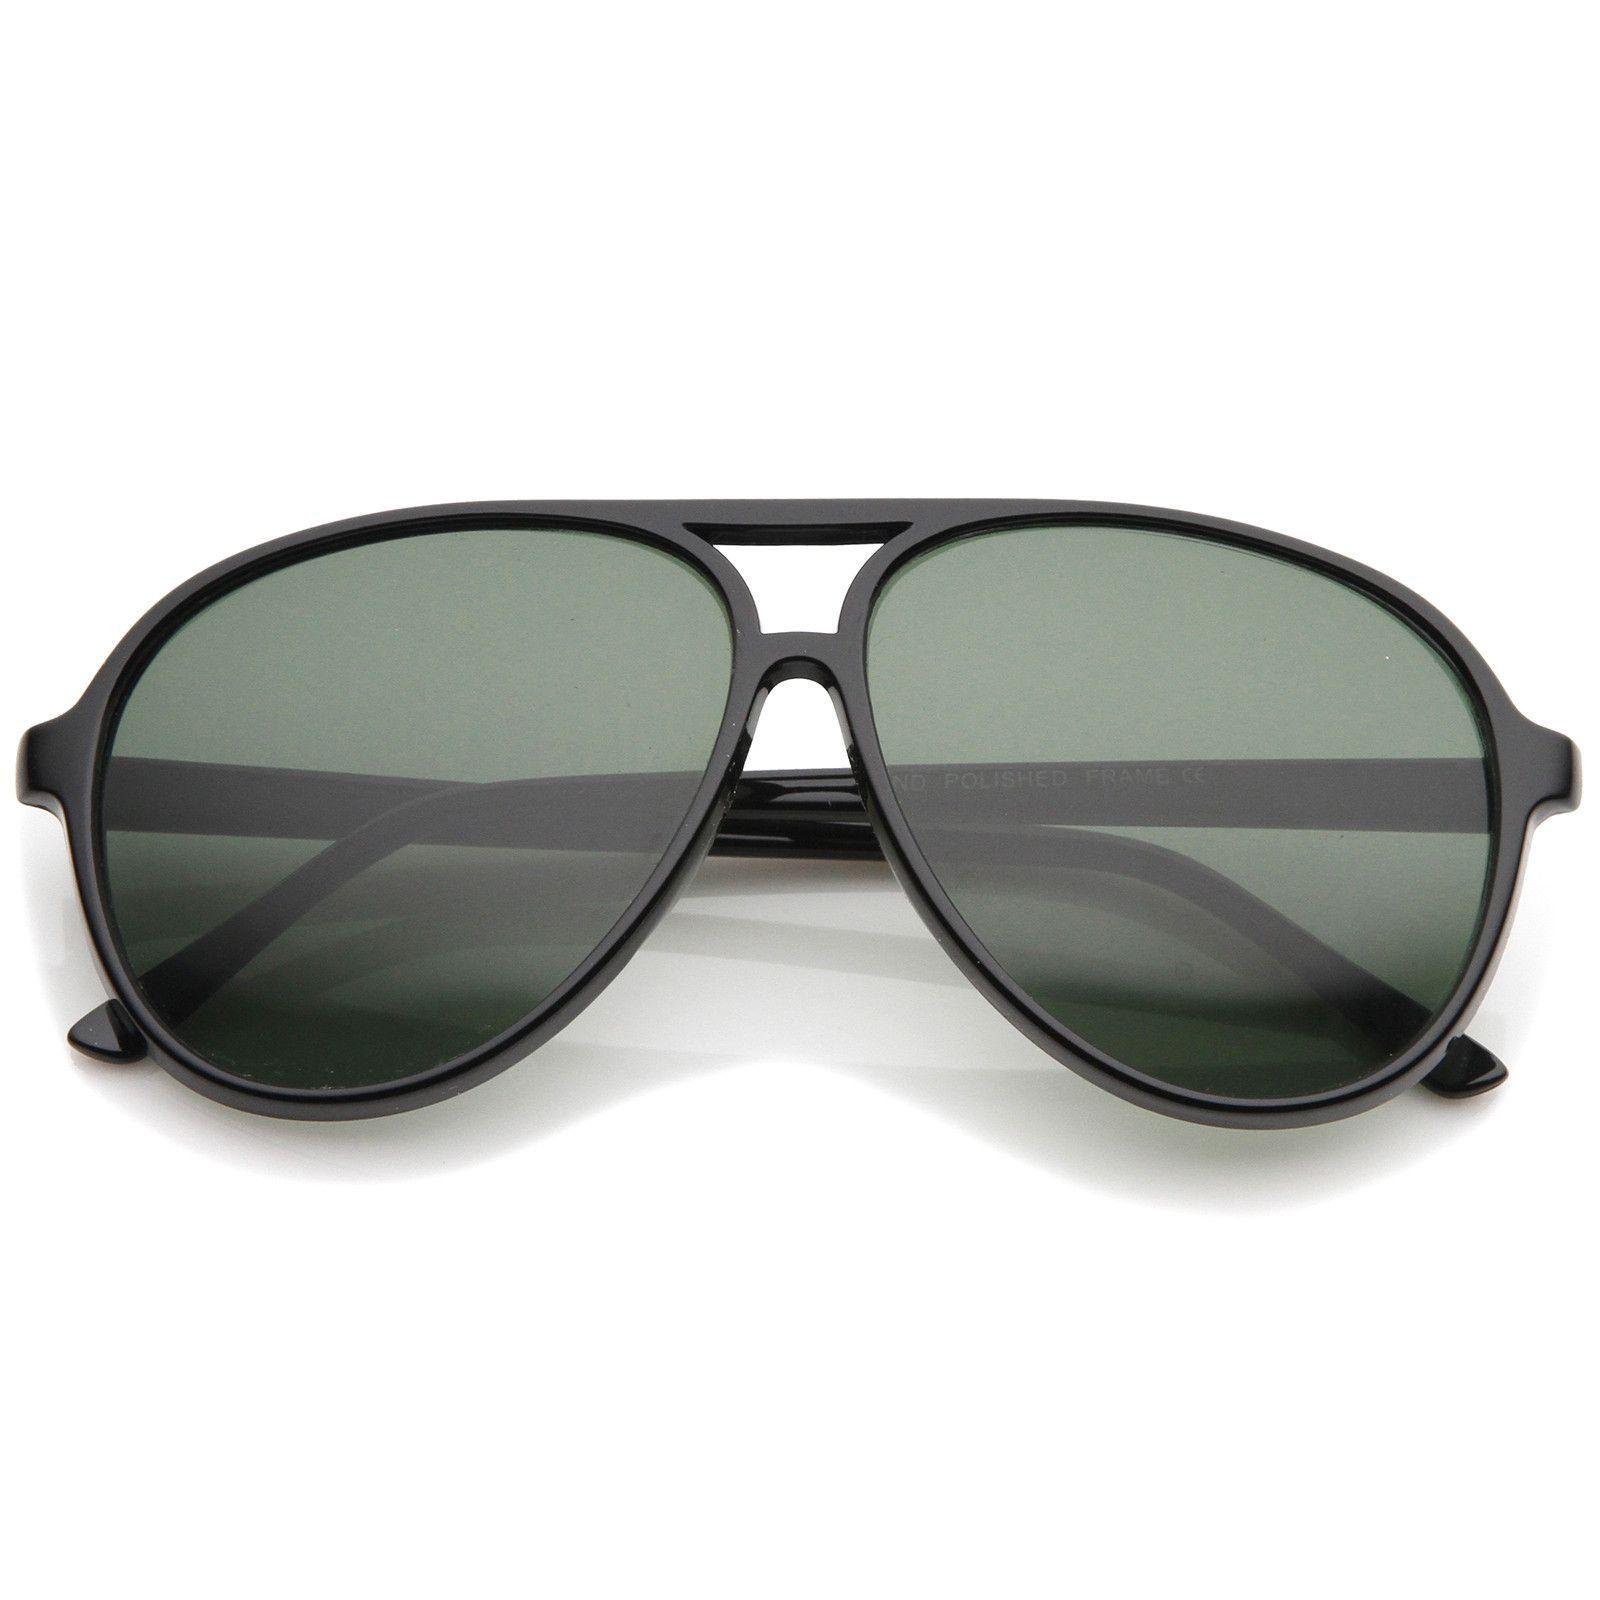 9a77ddefa Designer Inspired Large Flat Top Square Plastic Aviator Sunglasses | Glasses  Frames | Sunglasses, Glasses frames, Tops